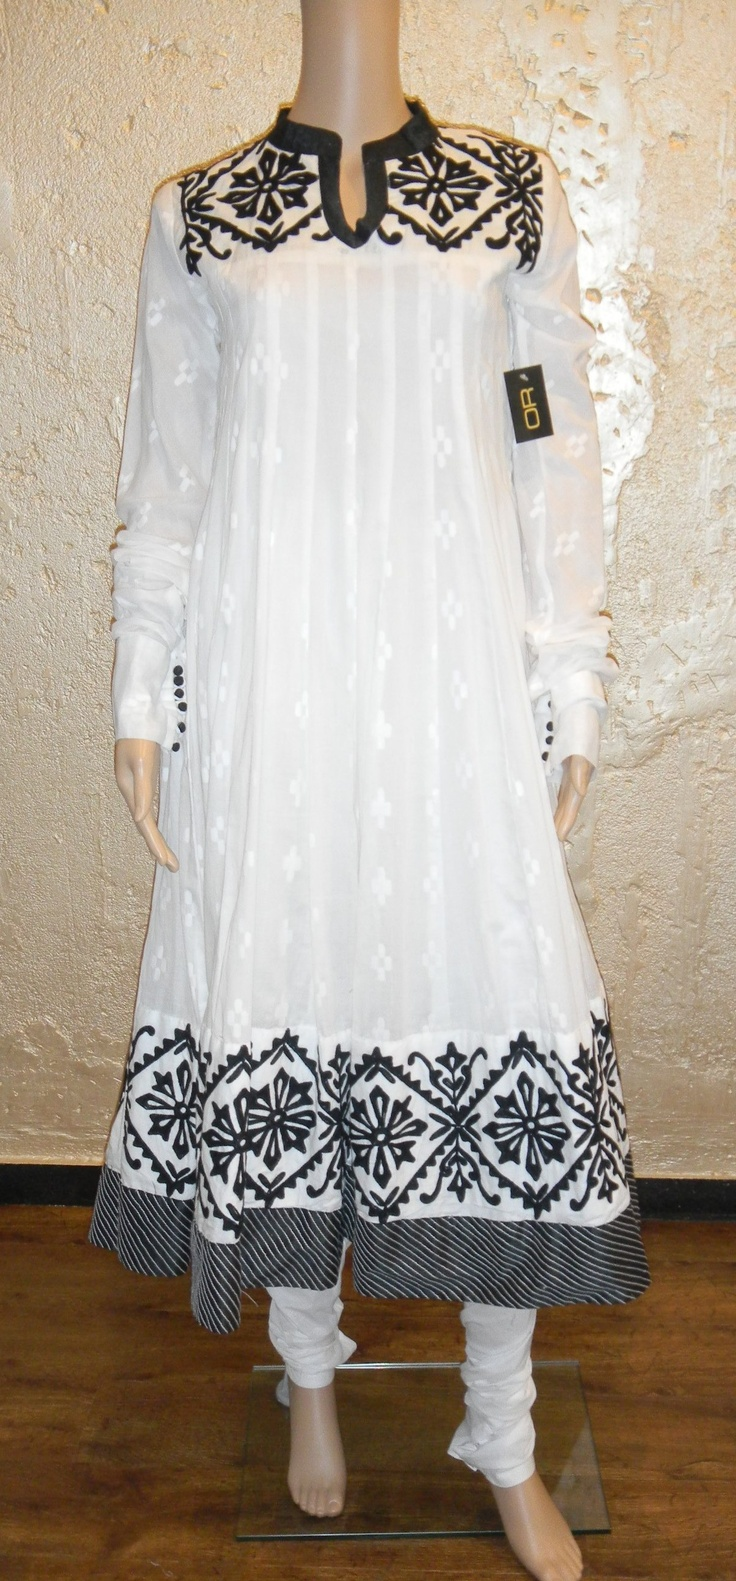 Cotton - Churidaar set  Price - Rs. 5900/-